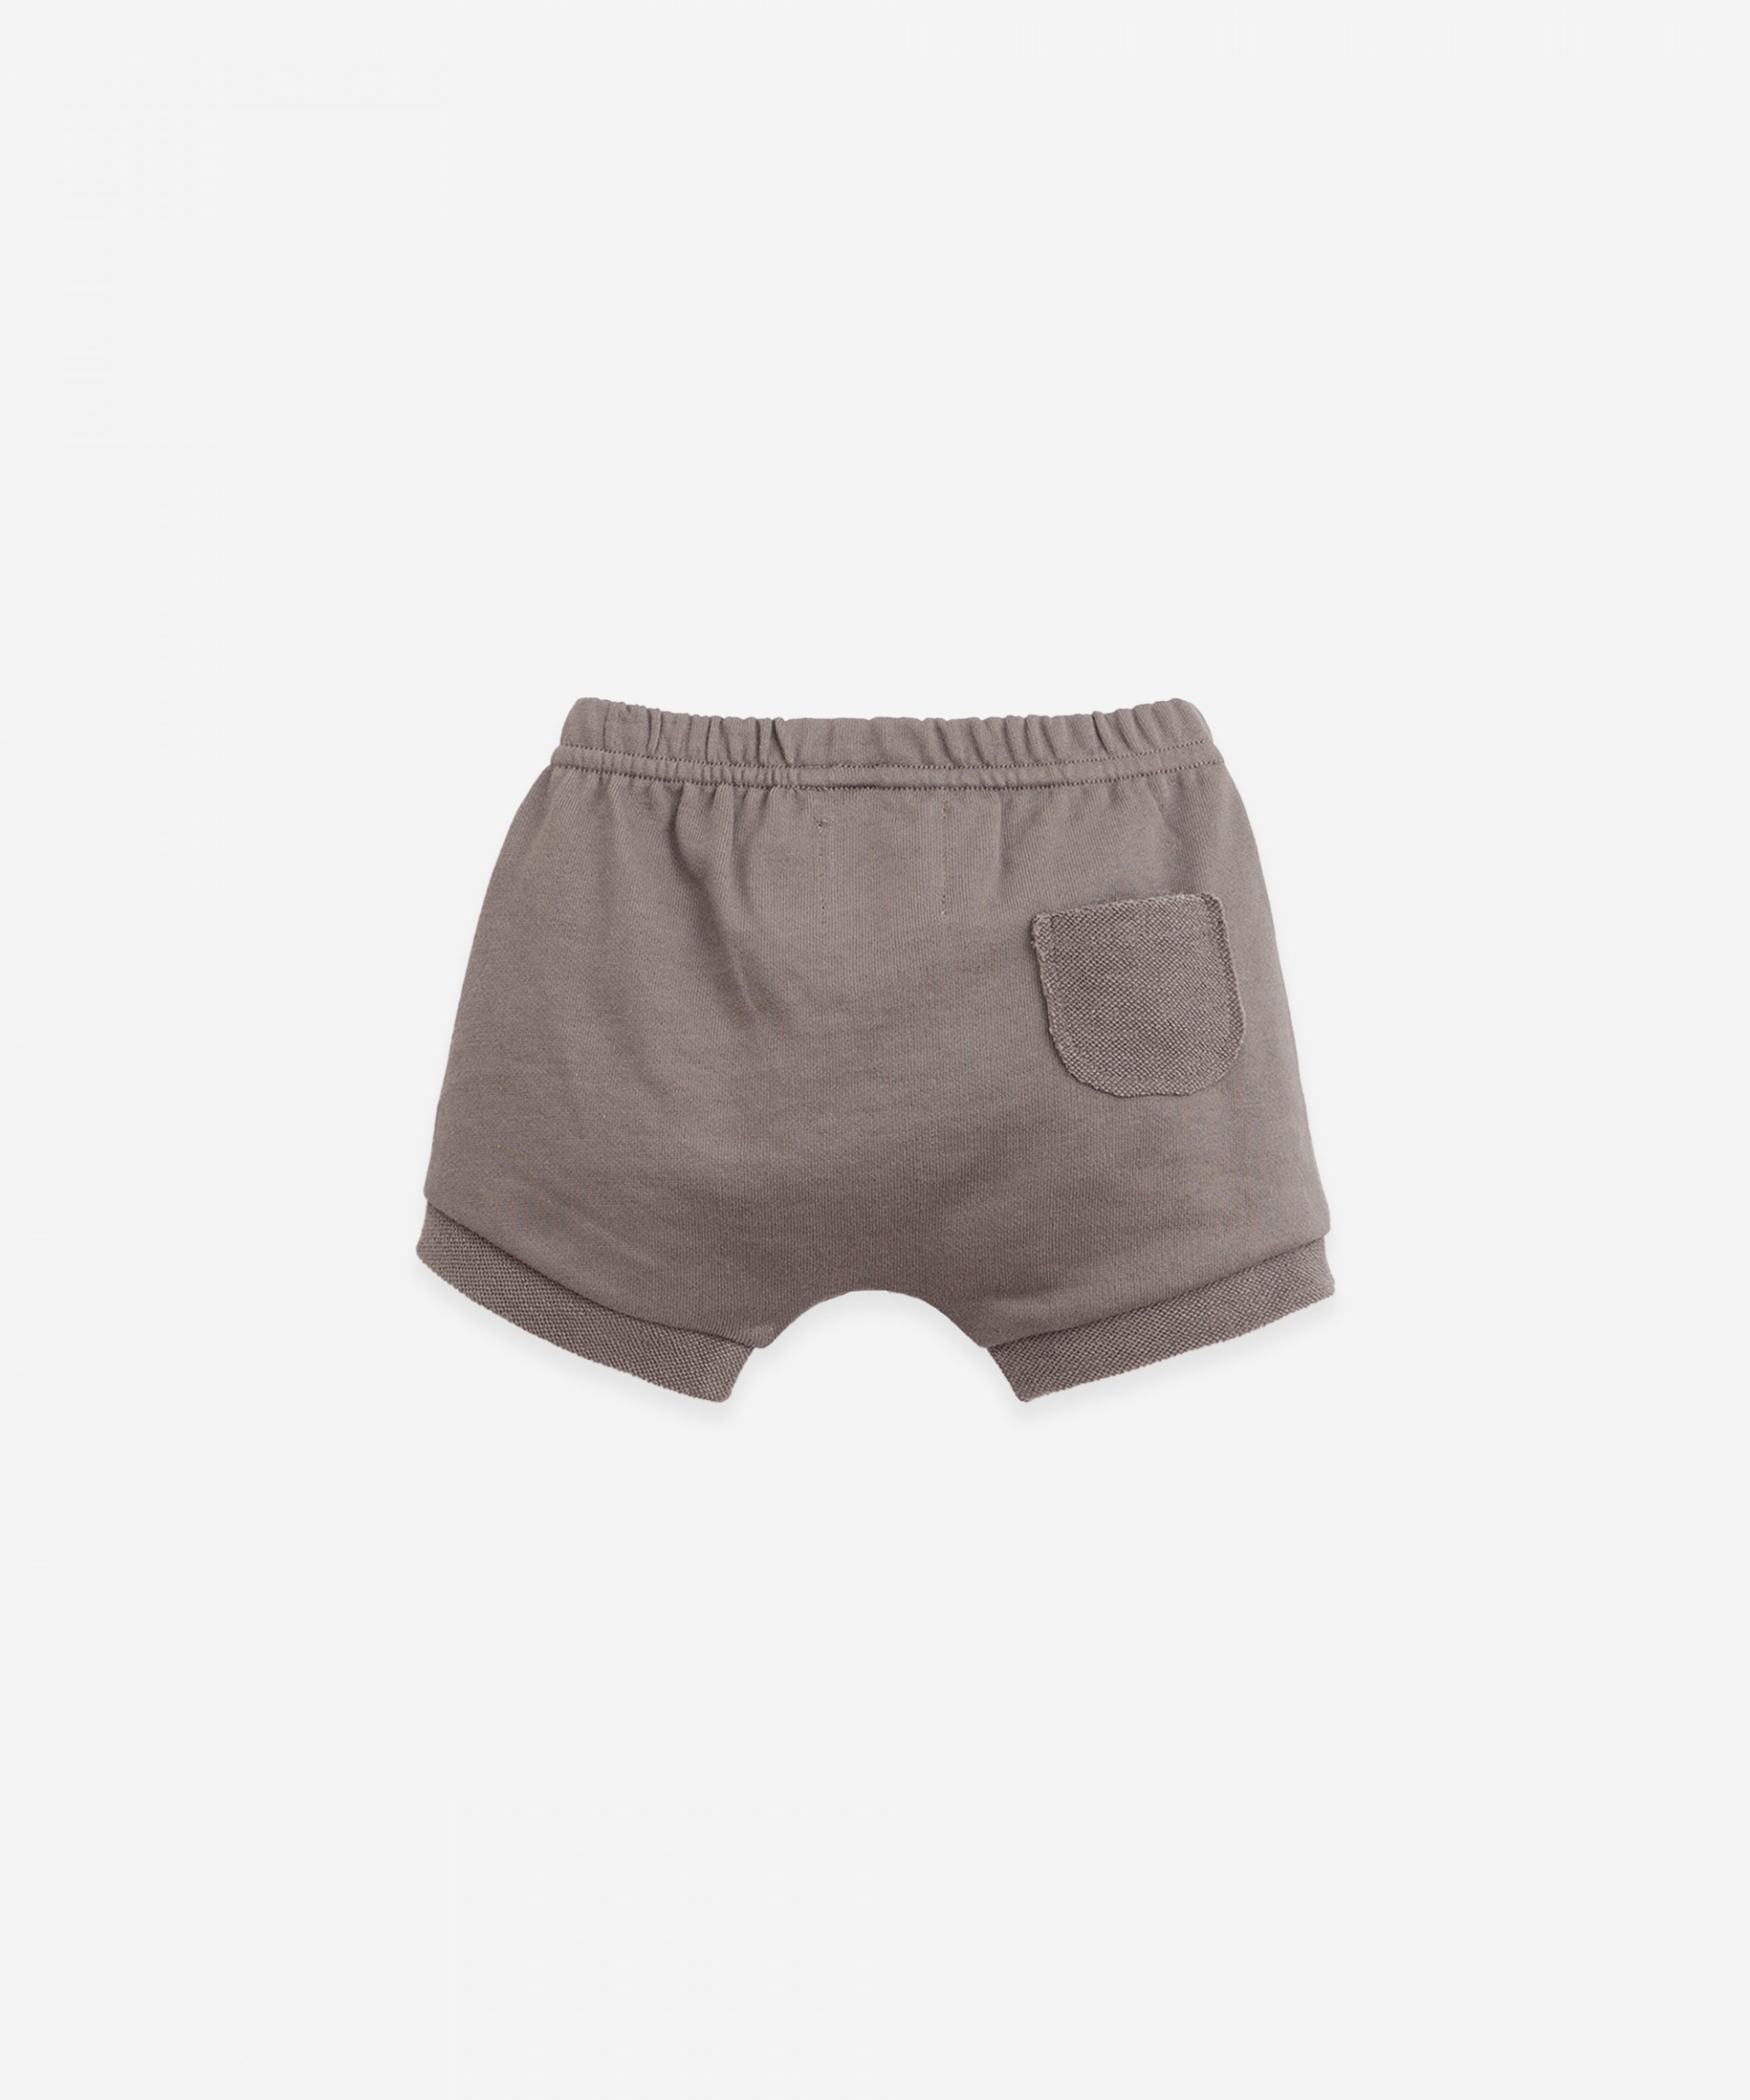 Pantalón corto con bolsillo del revés | Botany